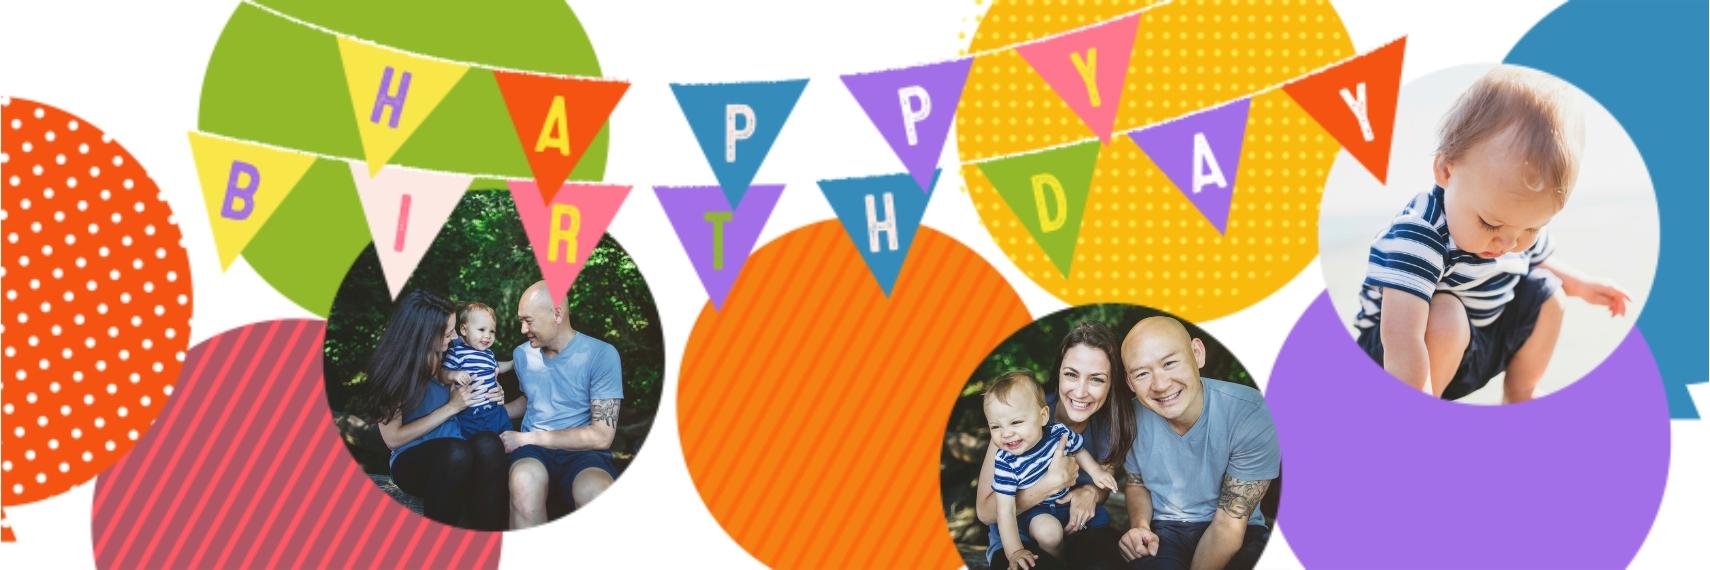 Birthday 1x3 Adhesive Banner, Home Décor -Balloon Banner